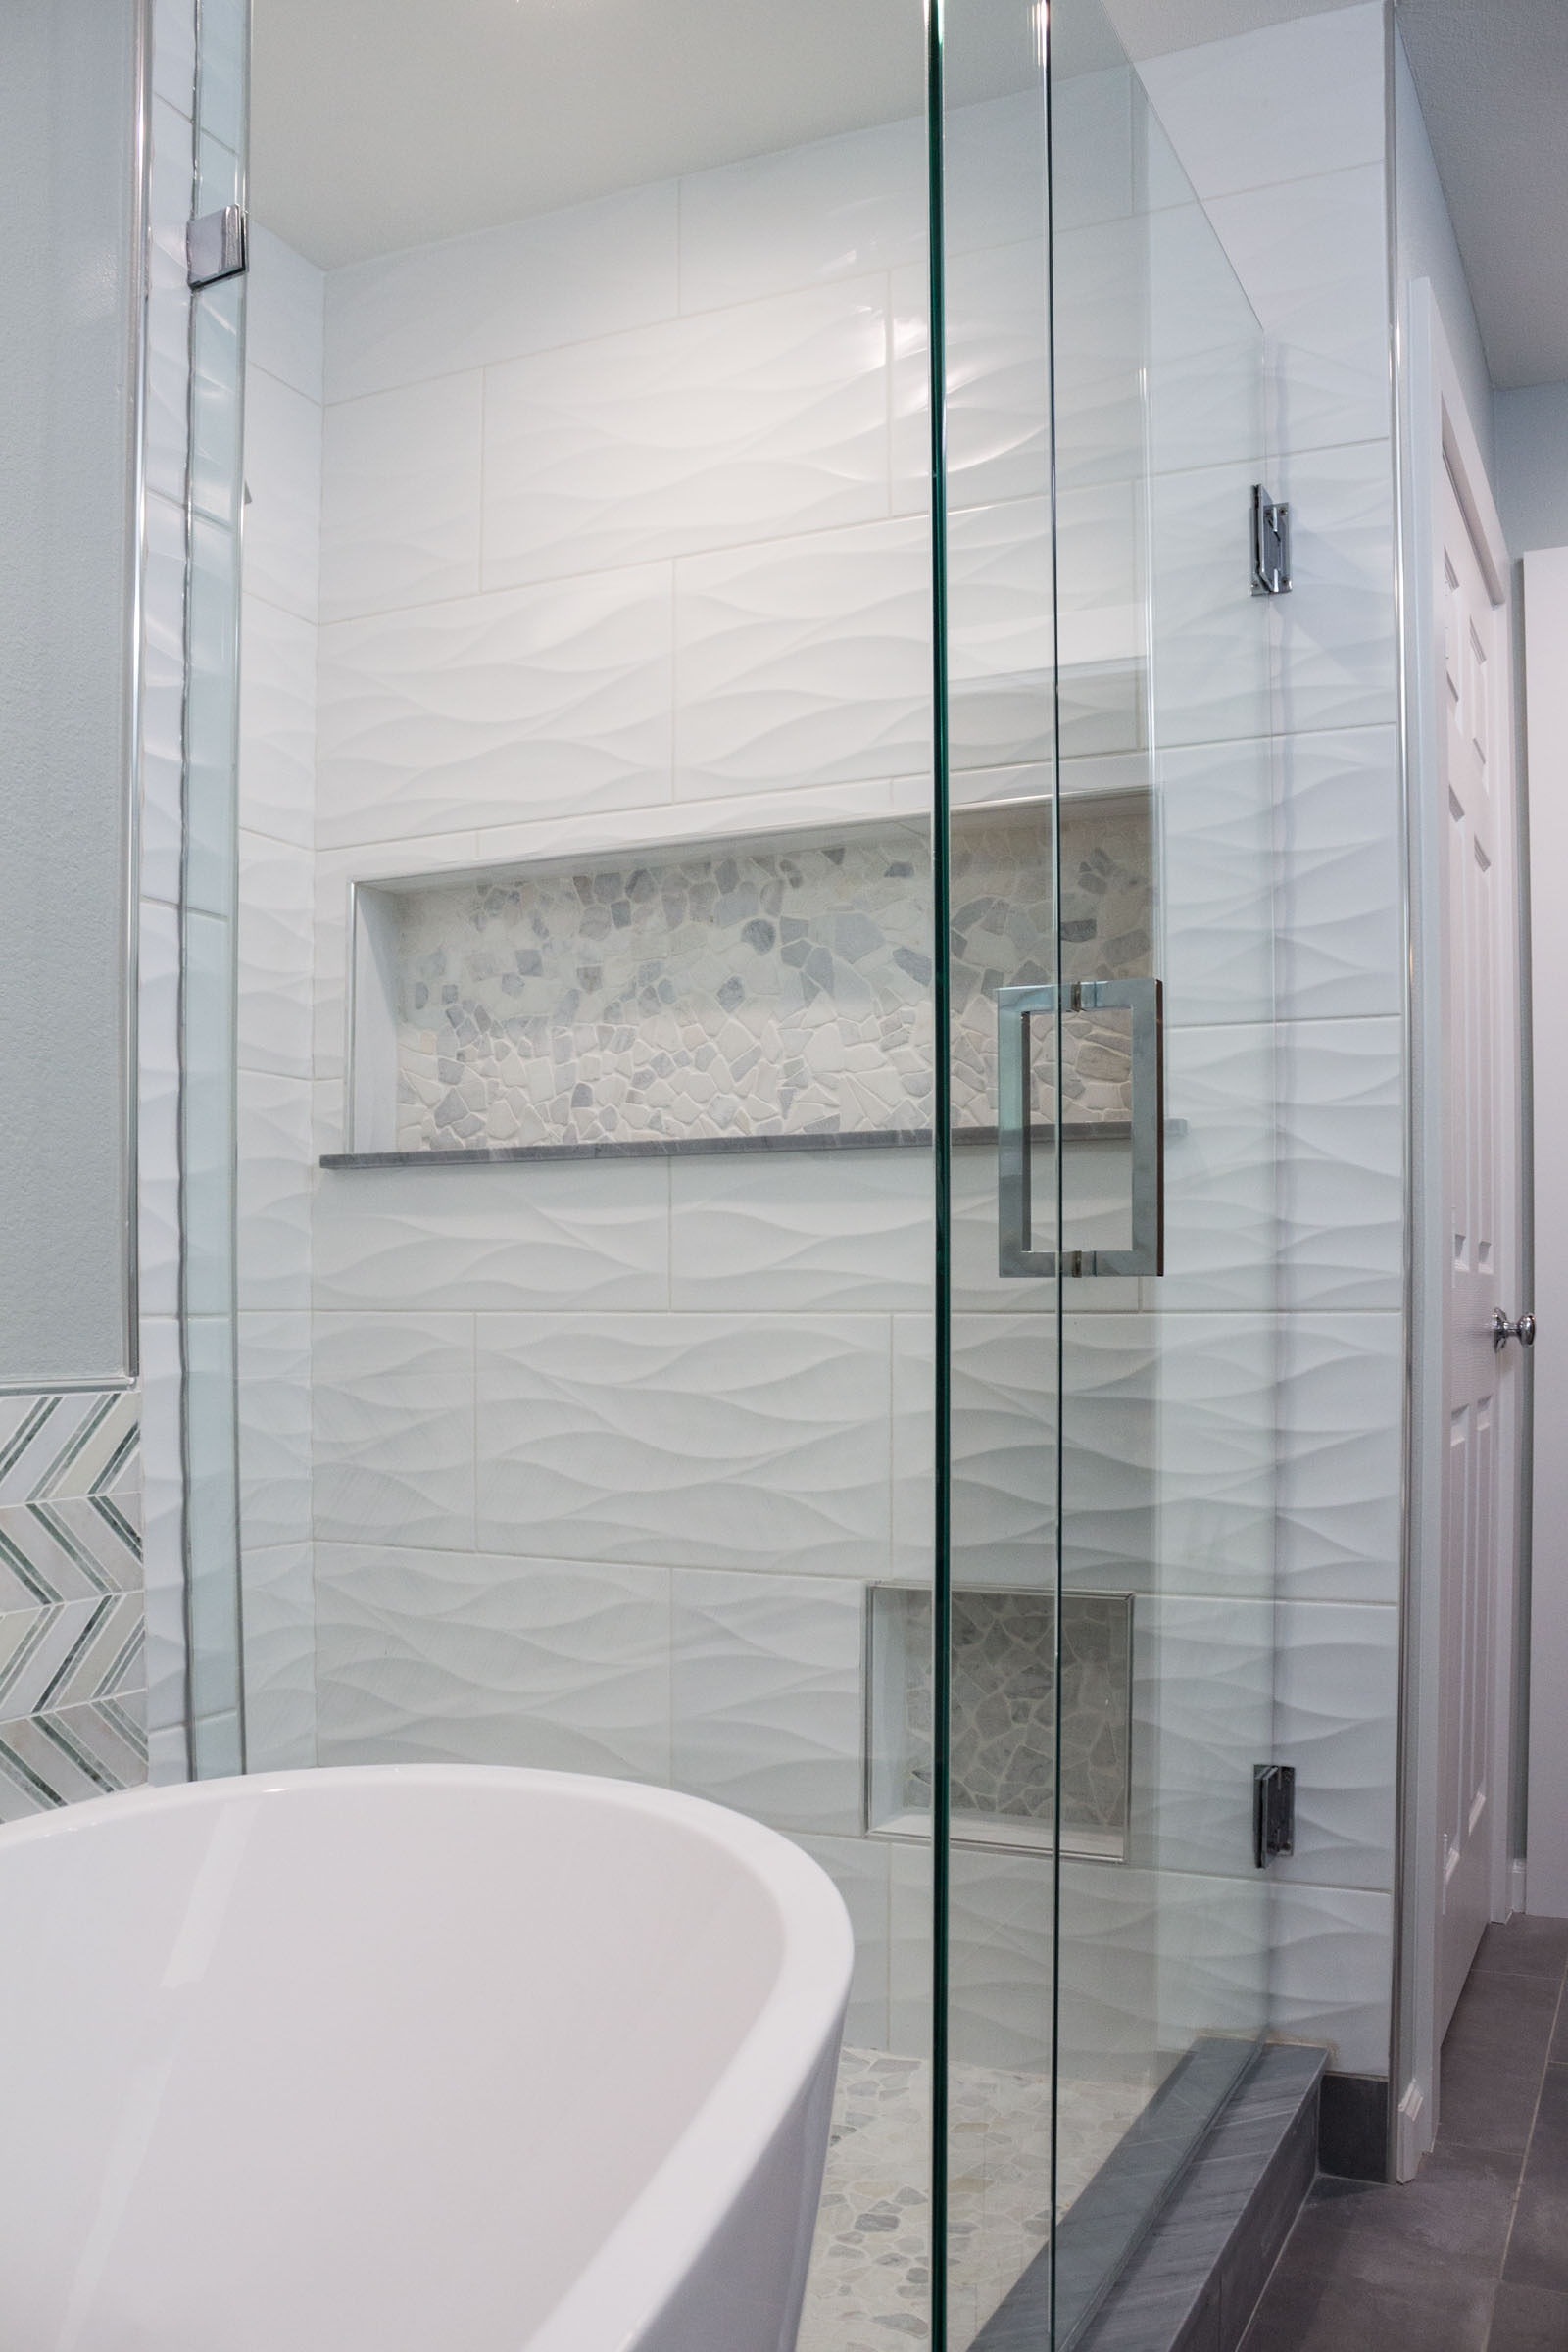 Bathroom remodel with walk in shower, glass doors, pedestal bathtub, and dark grey flooring